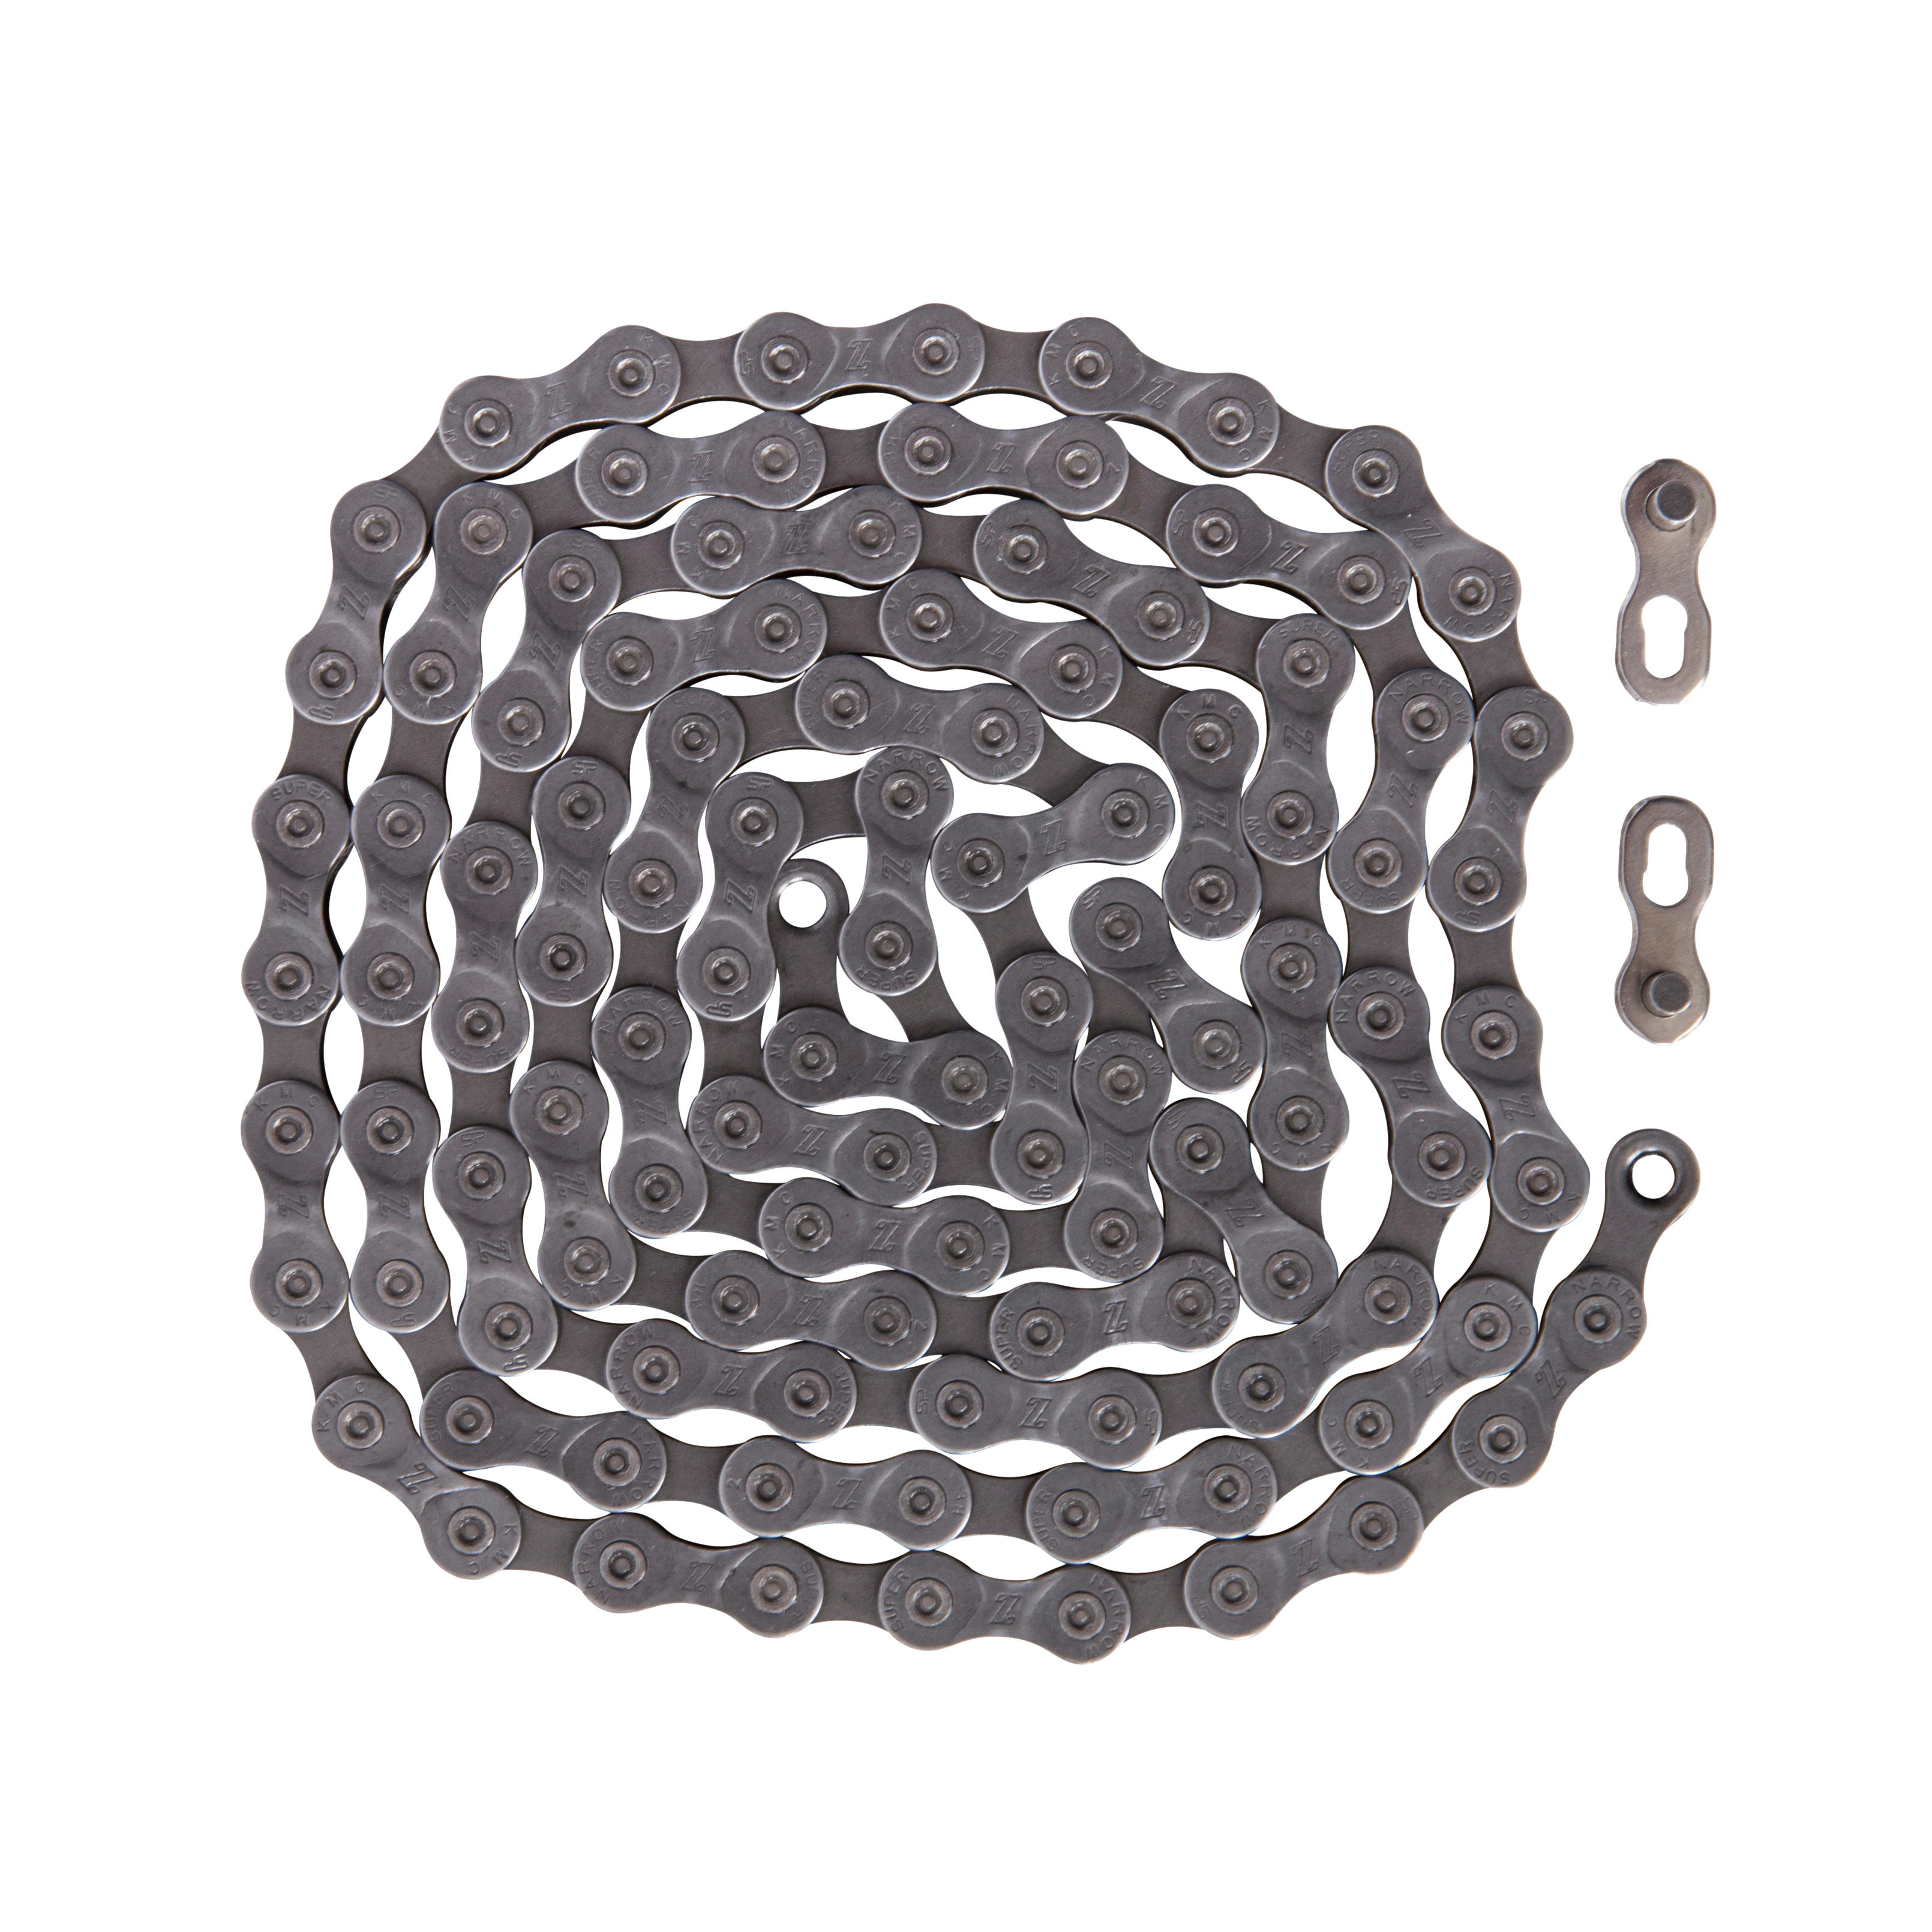 9-Speed Bike Chain